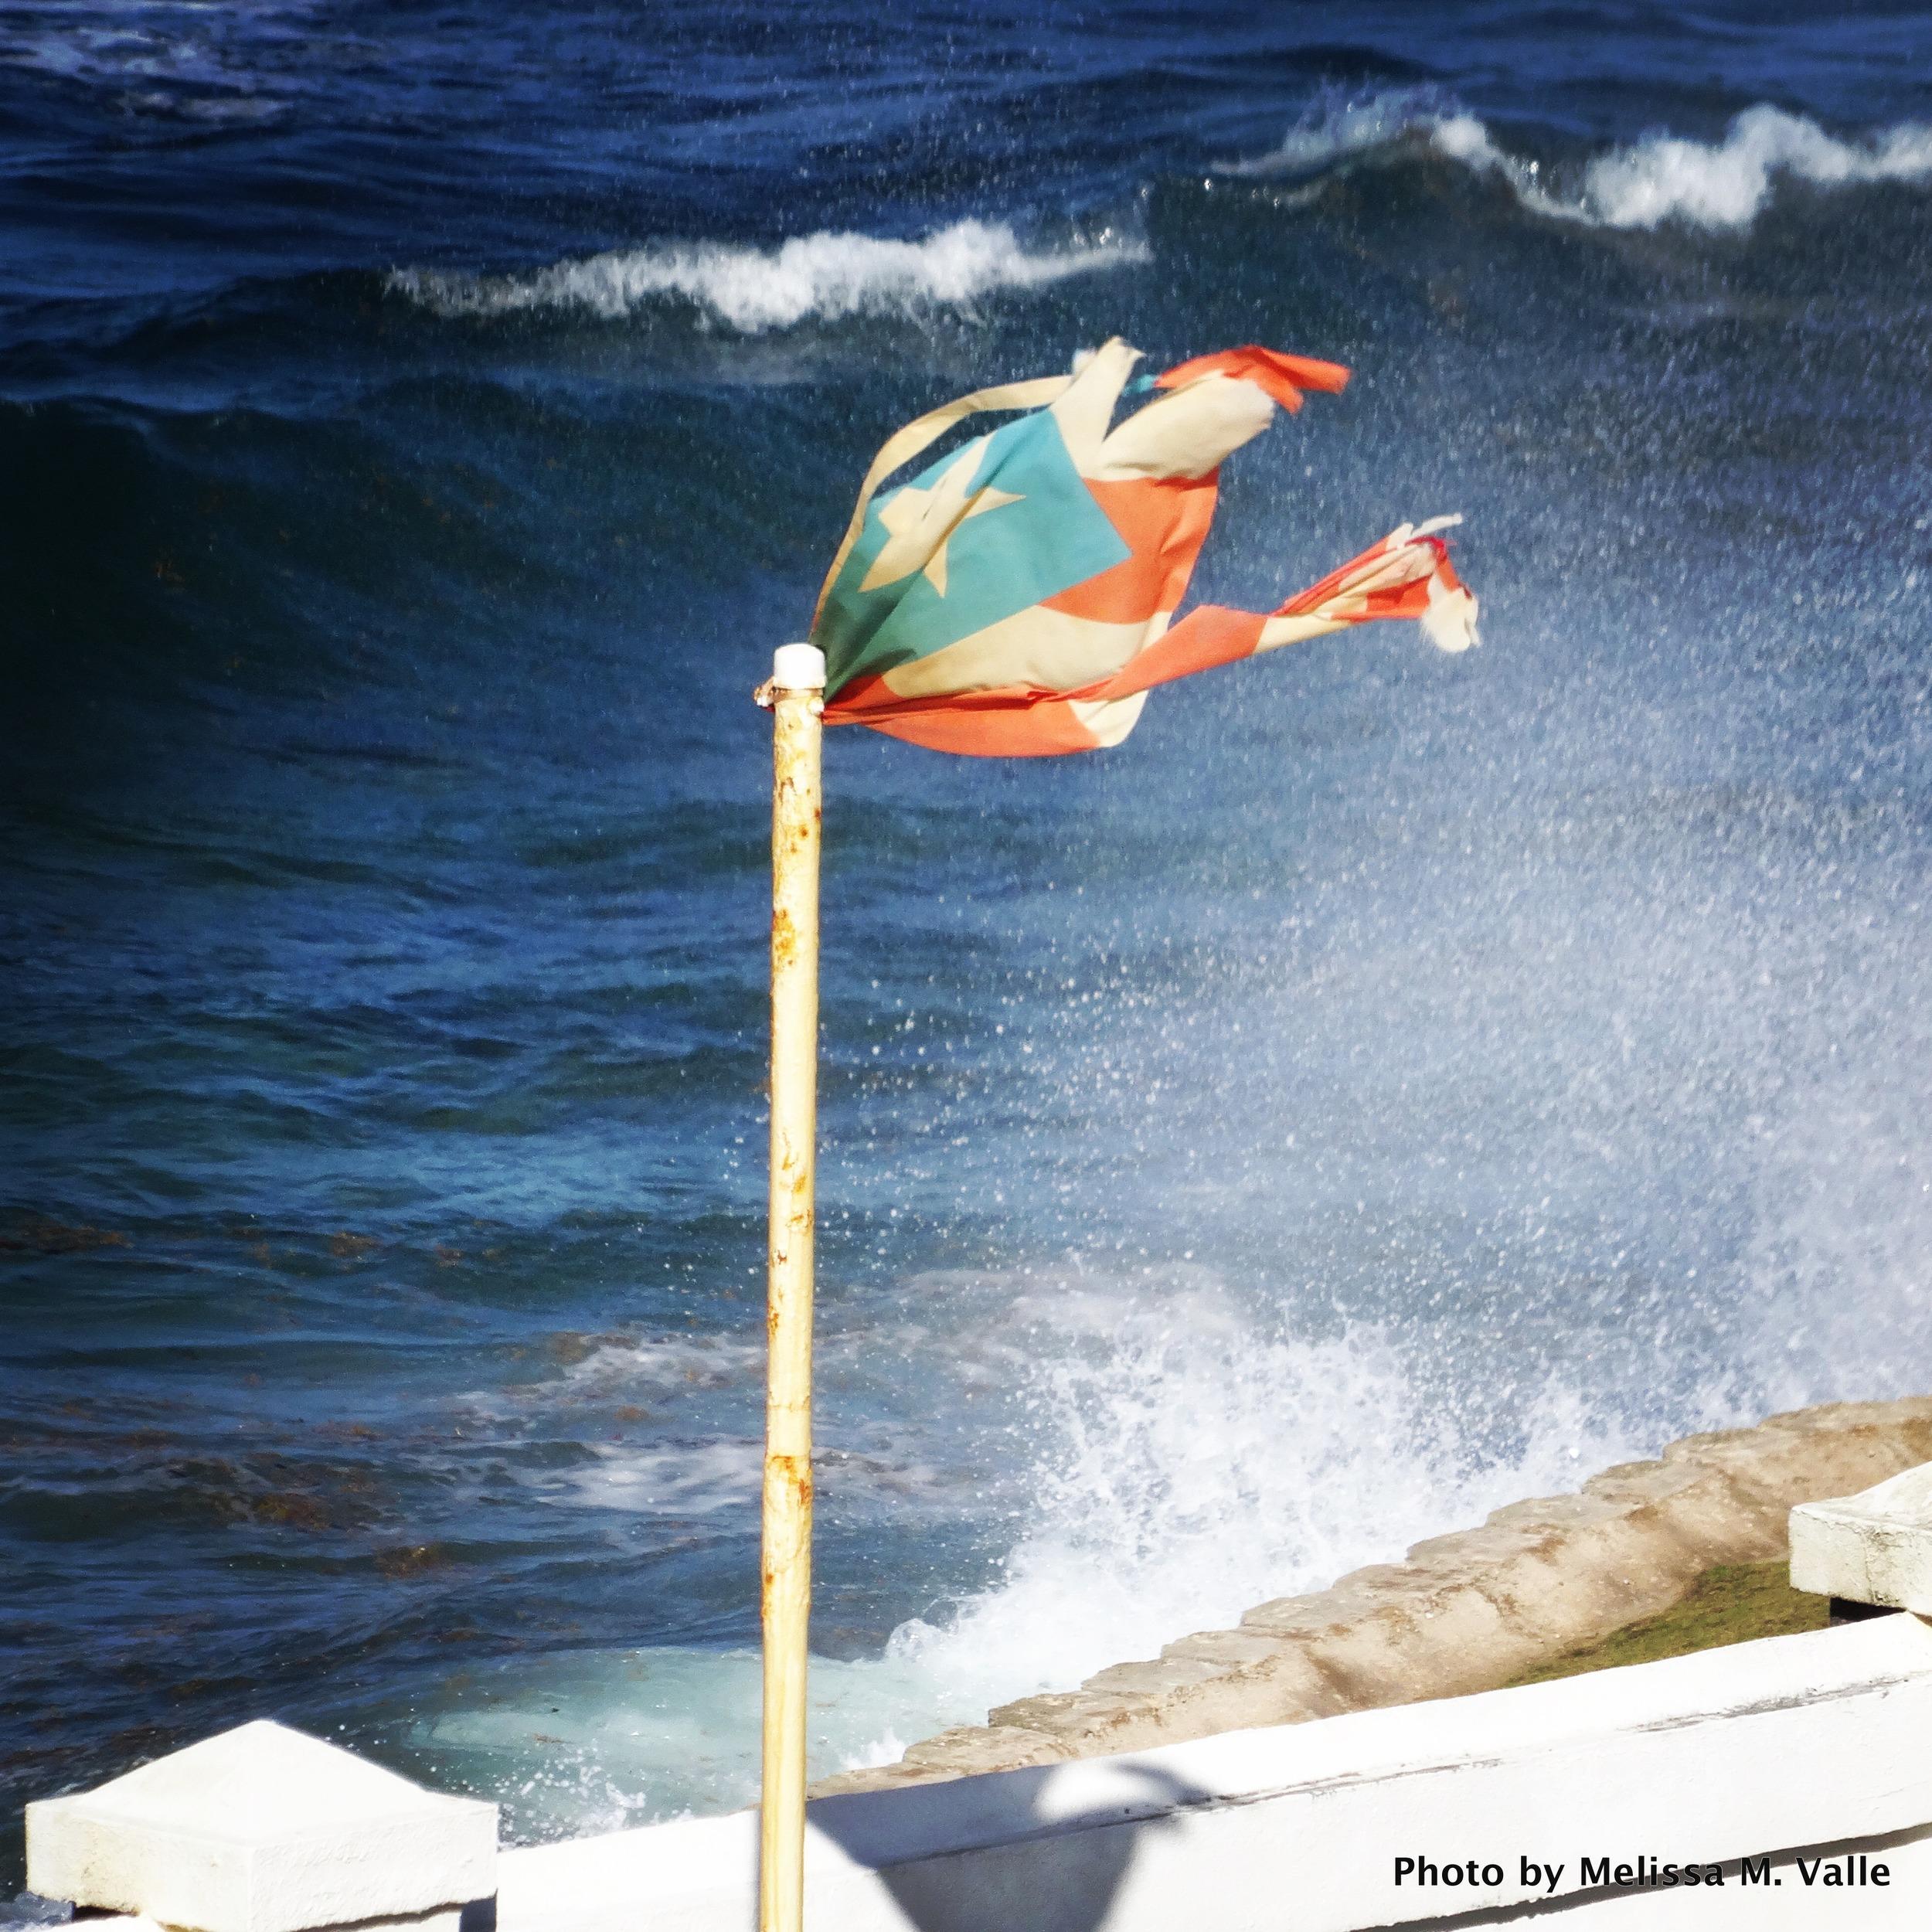 La Bandera, battered and bruised, but still flying